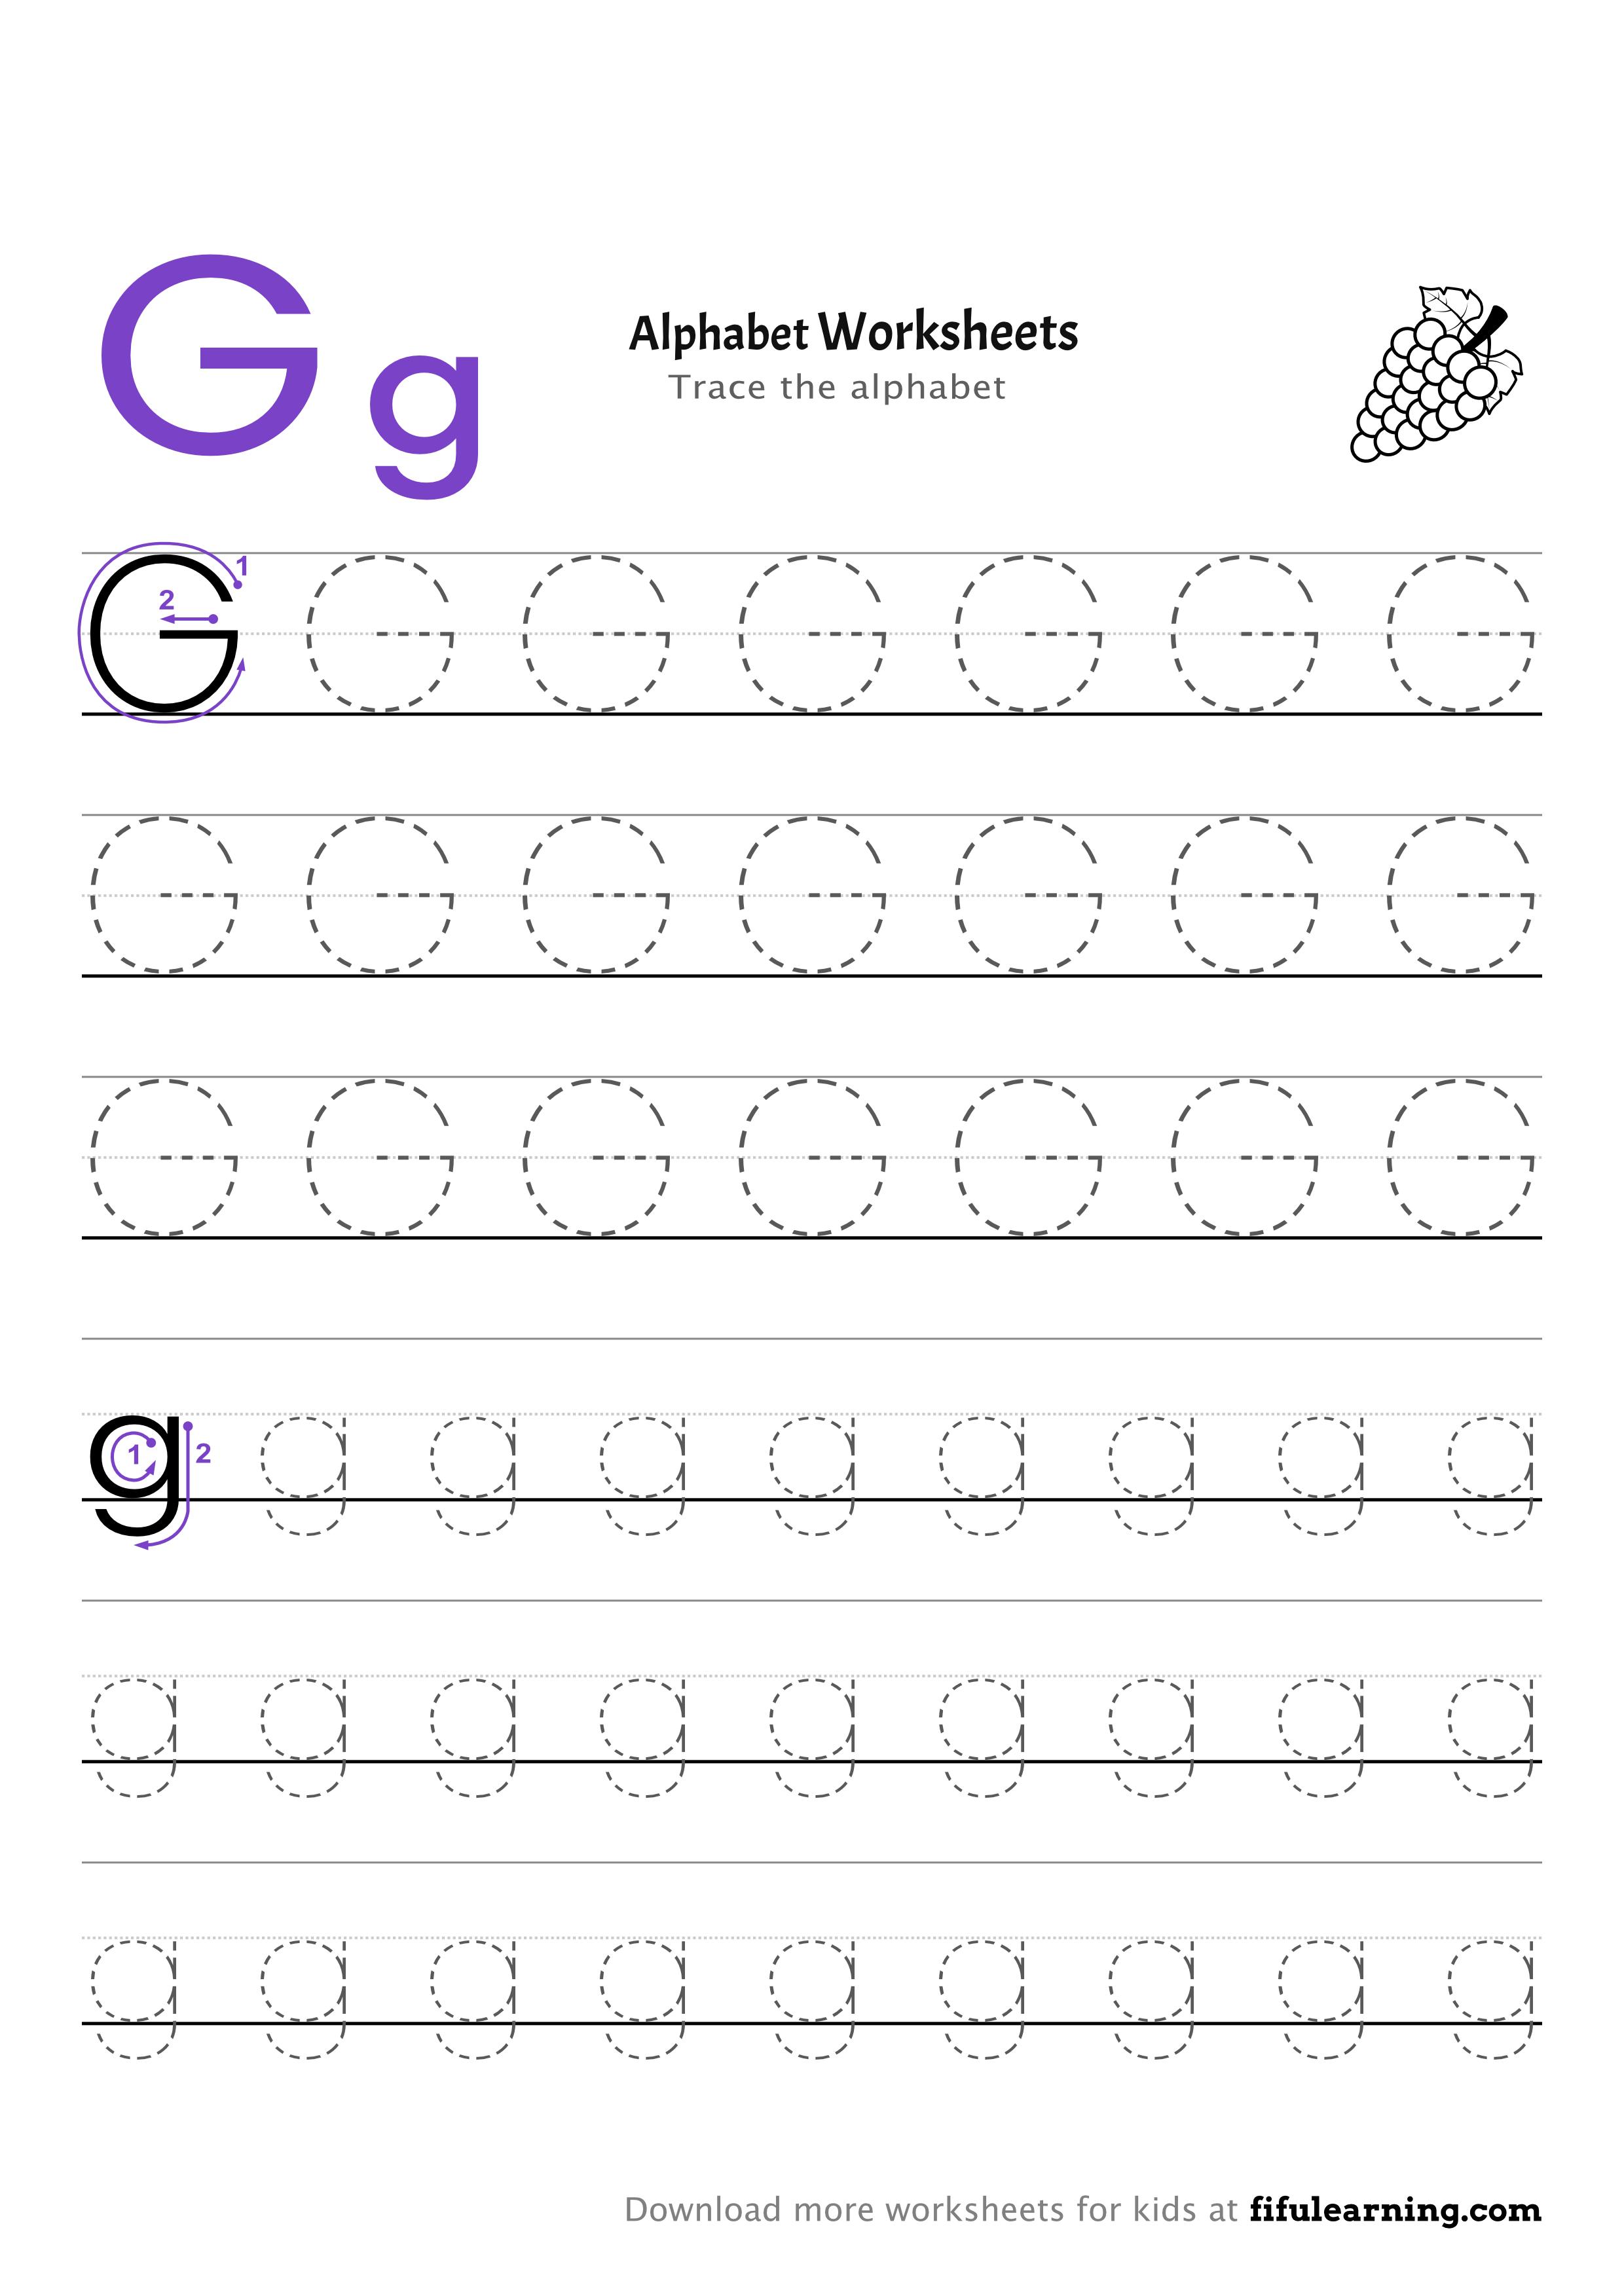 Tracing Alphabet Worksheet For Kids G G Worksheets Alphabet Worksheets Worksheets For Kids [ 3507 x 2480 Pixel ]